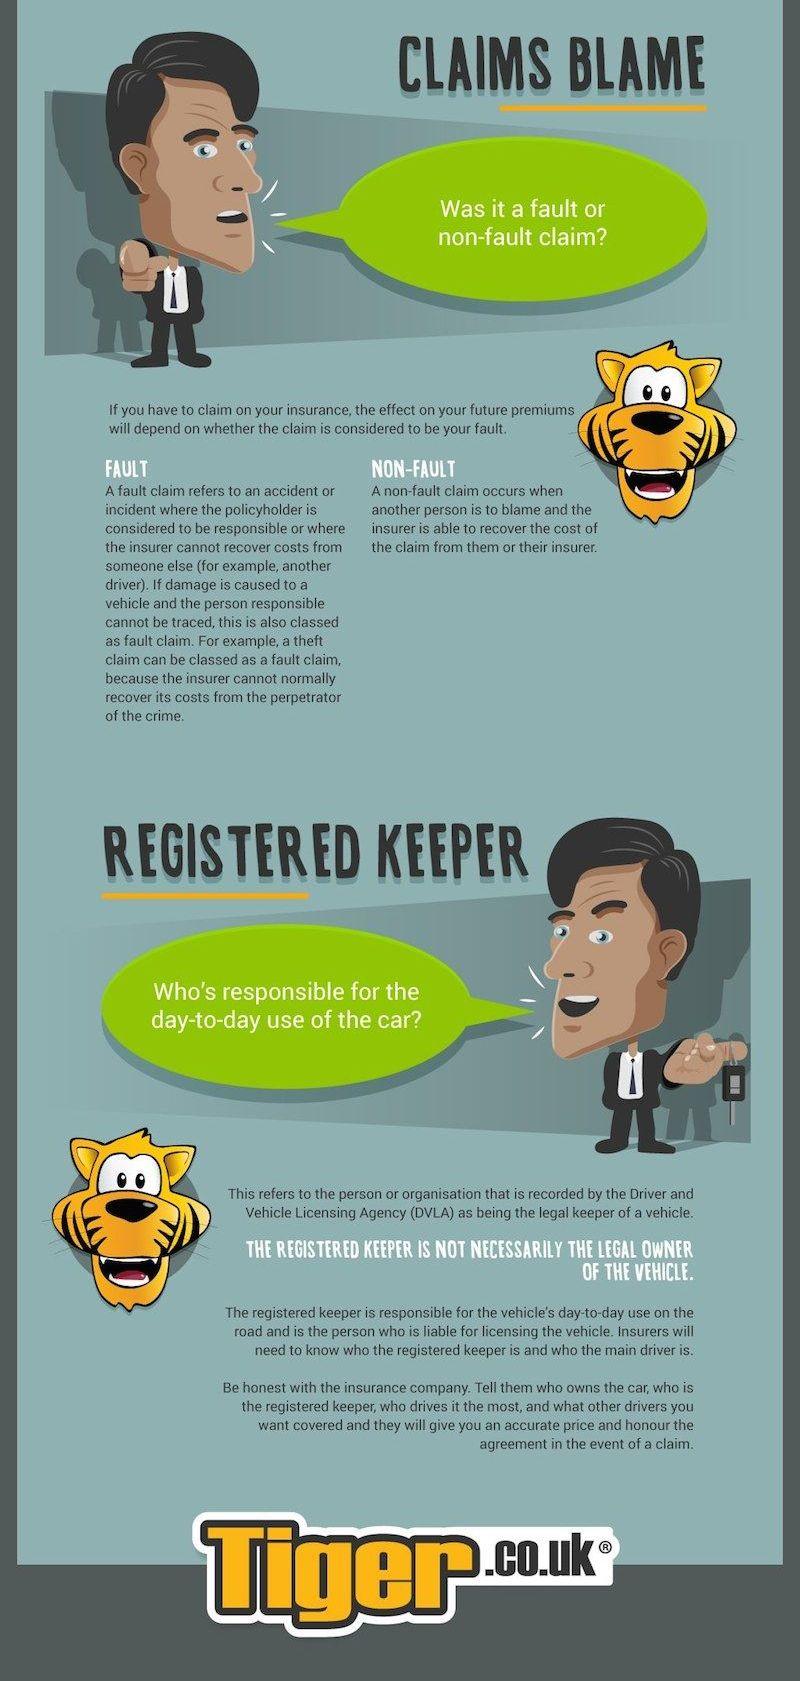 car insurance jargon explained in plain English